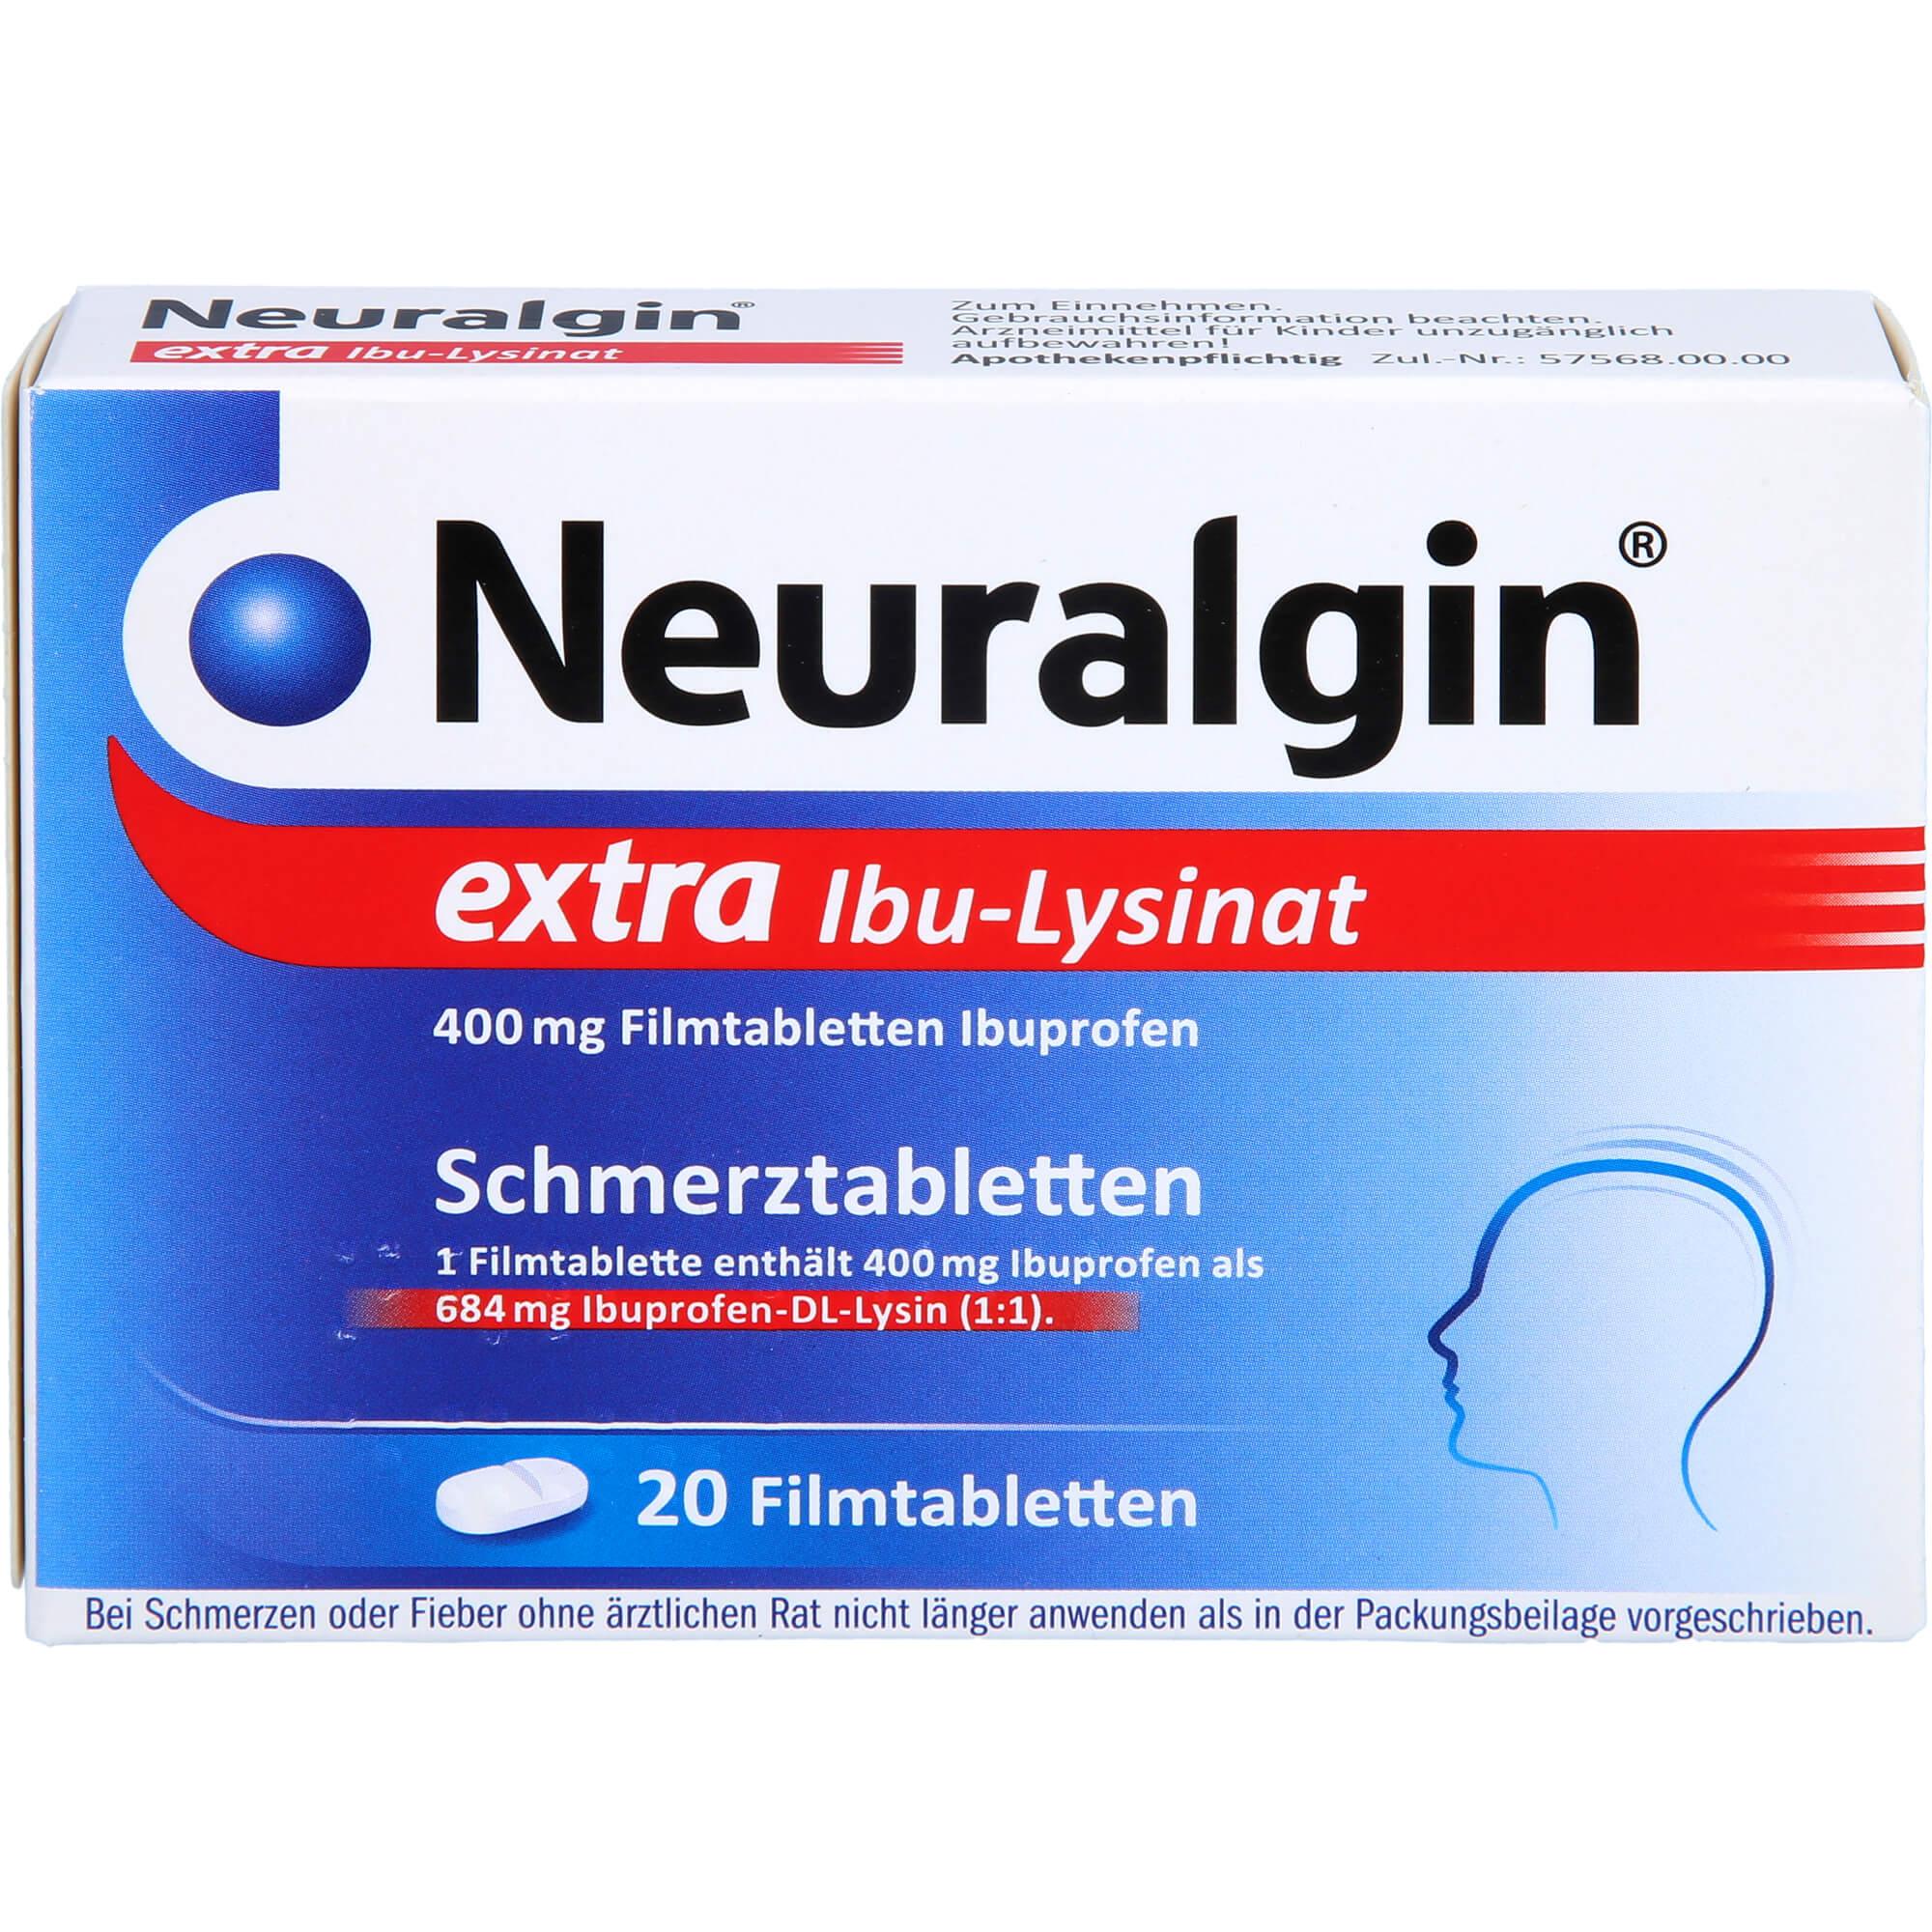 NEURALGIN-extra-Ibu-Lysinat-Filmtabletten